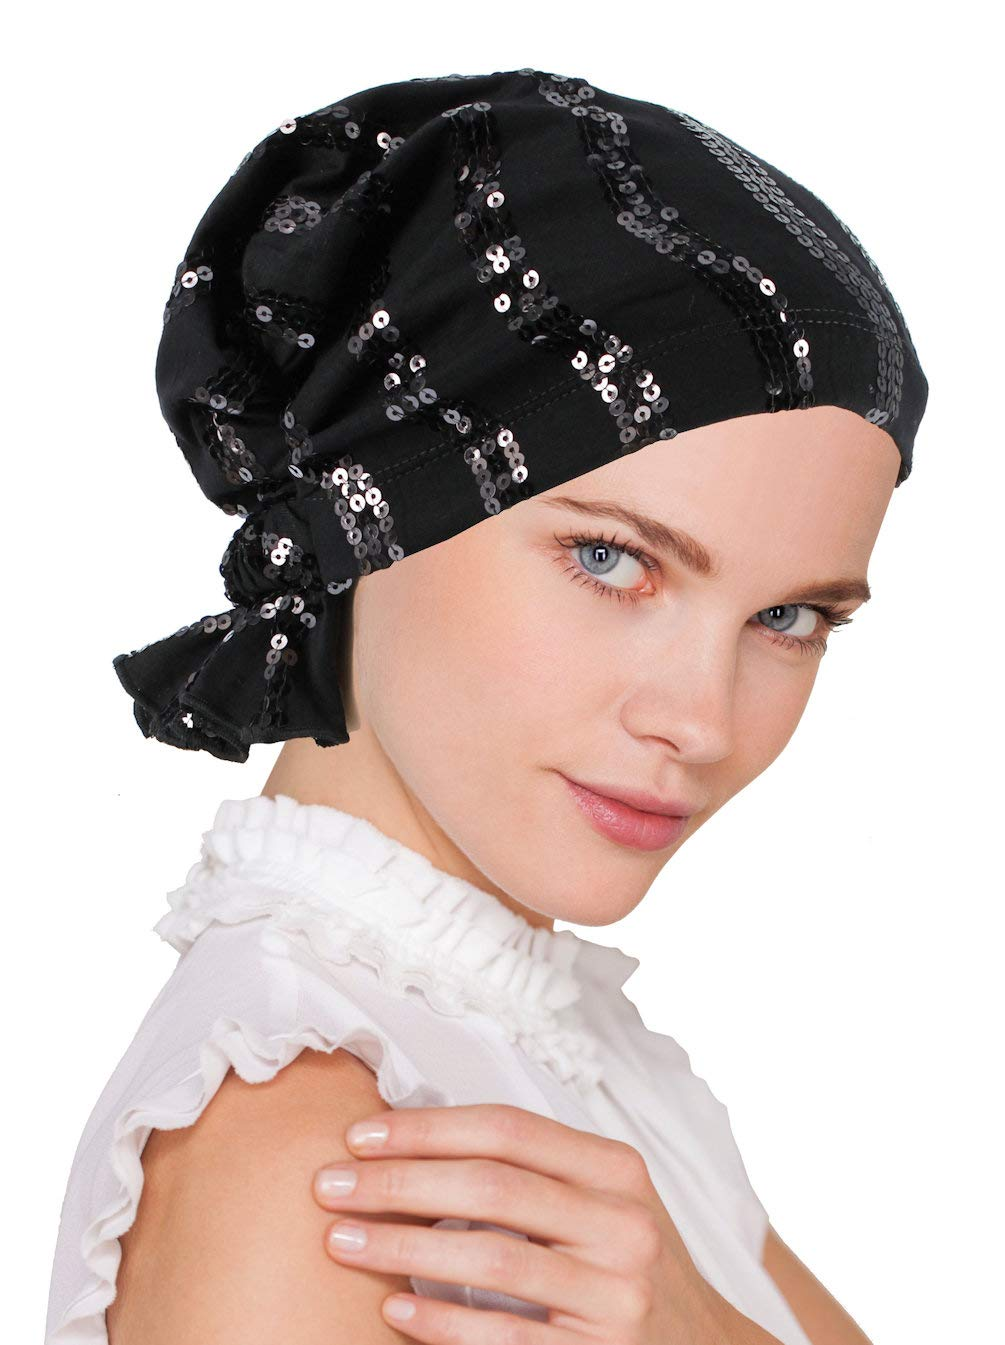 Abbey Cap Womens Chemo Hat Beanie Scarf Turban Headwear for Cancer Cotton Sequin Black by Turban Plus (Image #1)